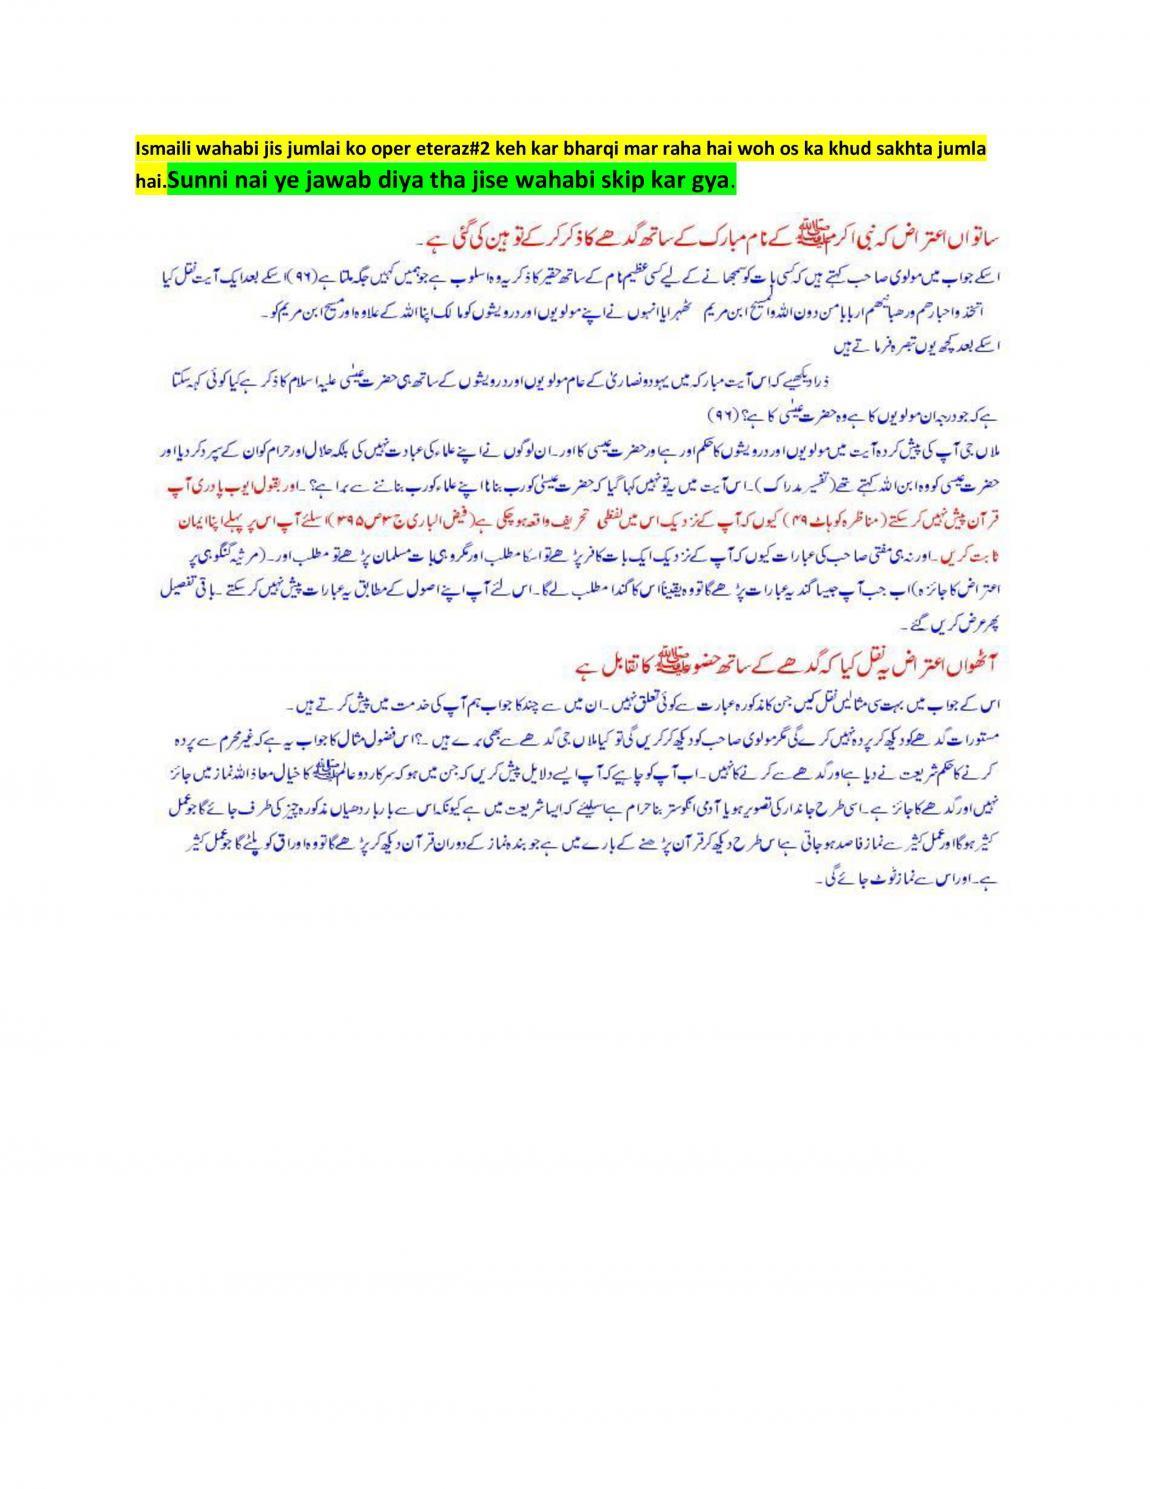 Ismaili Wahabi nay Sunni ka jawab perha he nahi-page-1 (1).jpg